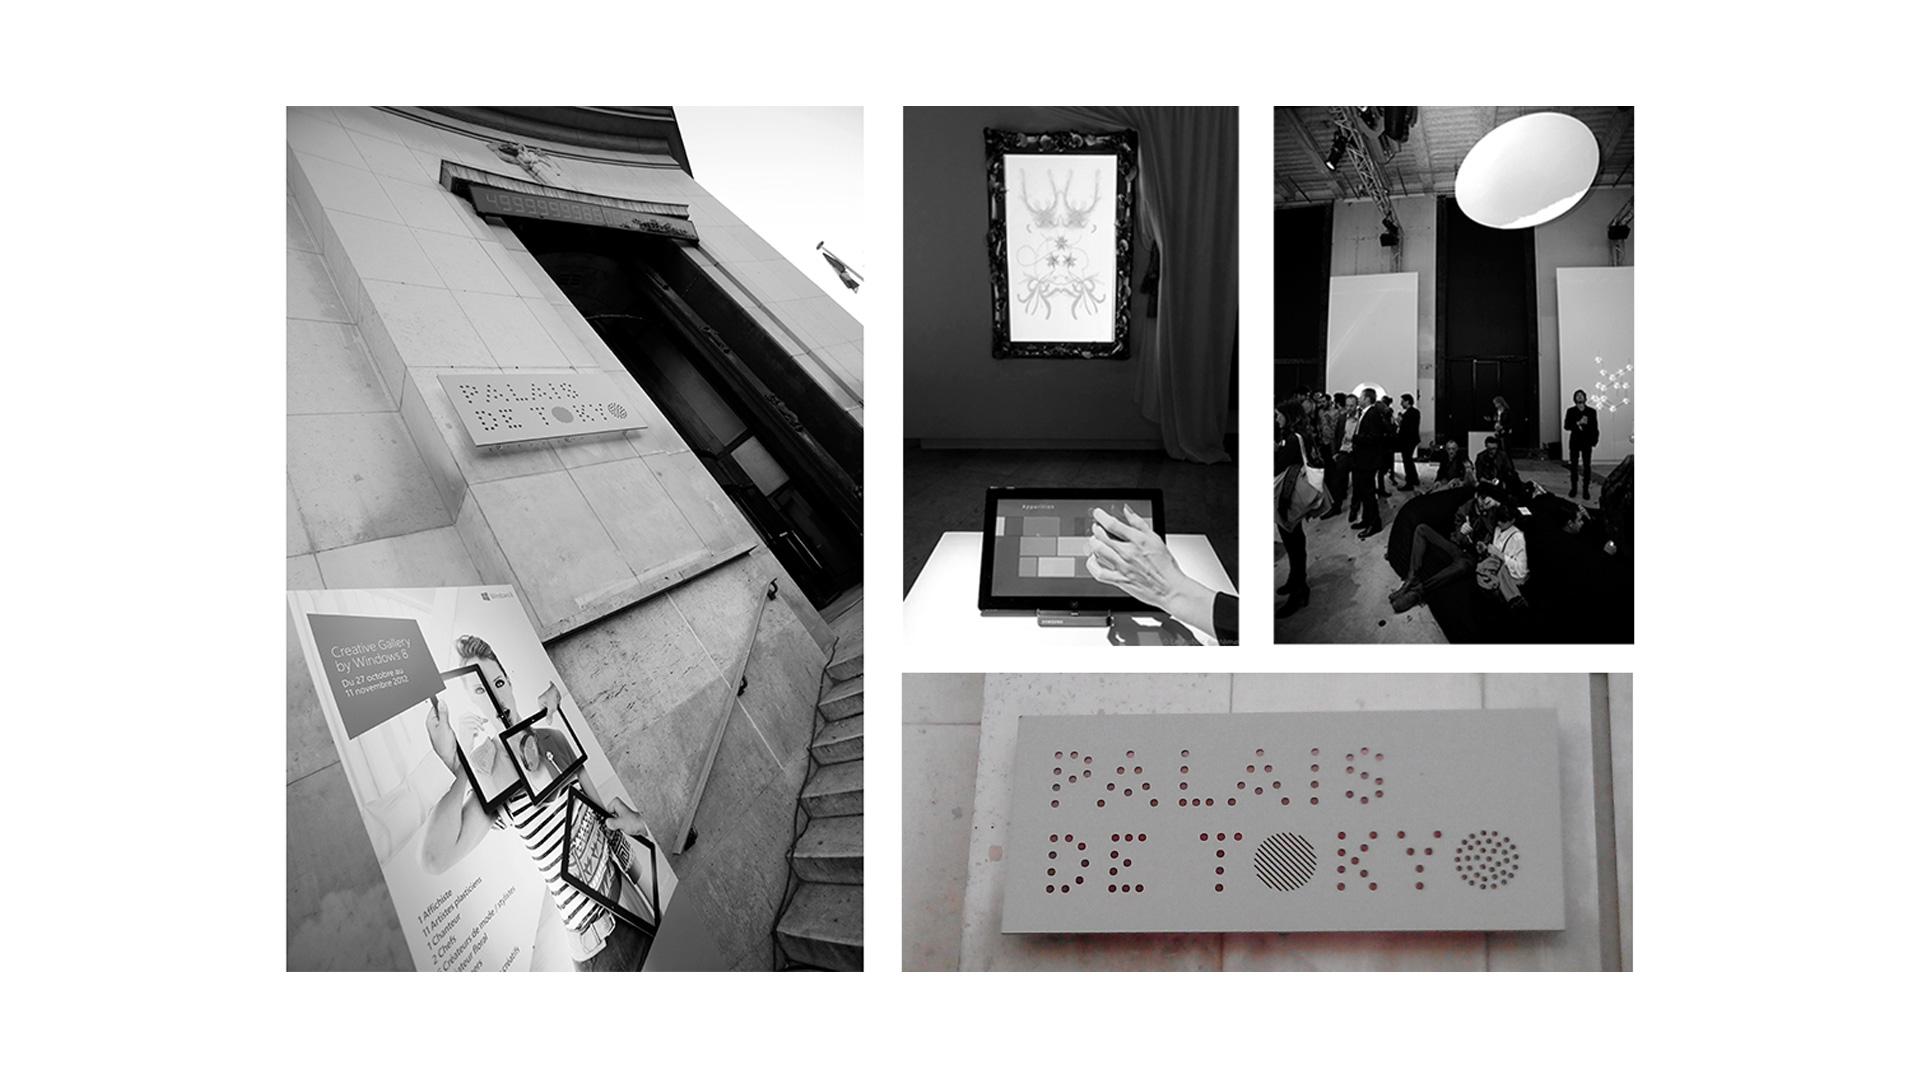 4-inoui-paris-creative-digital-print-installation-art-palais-de-tokyo